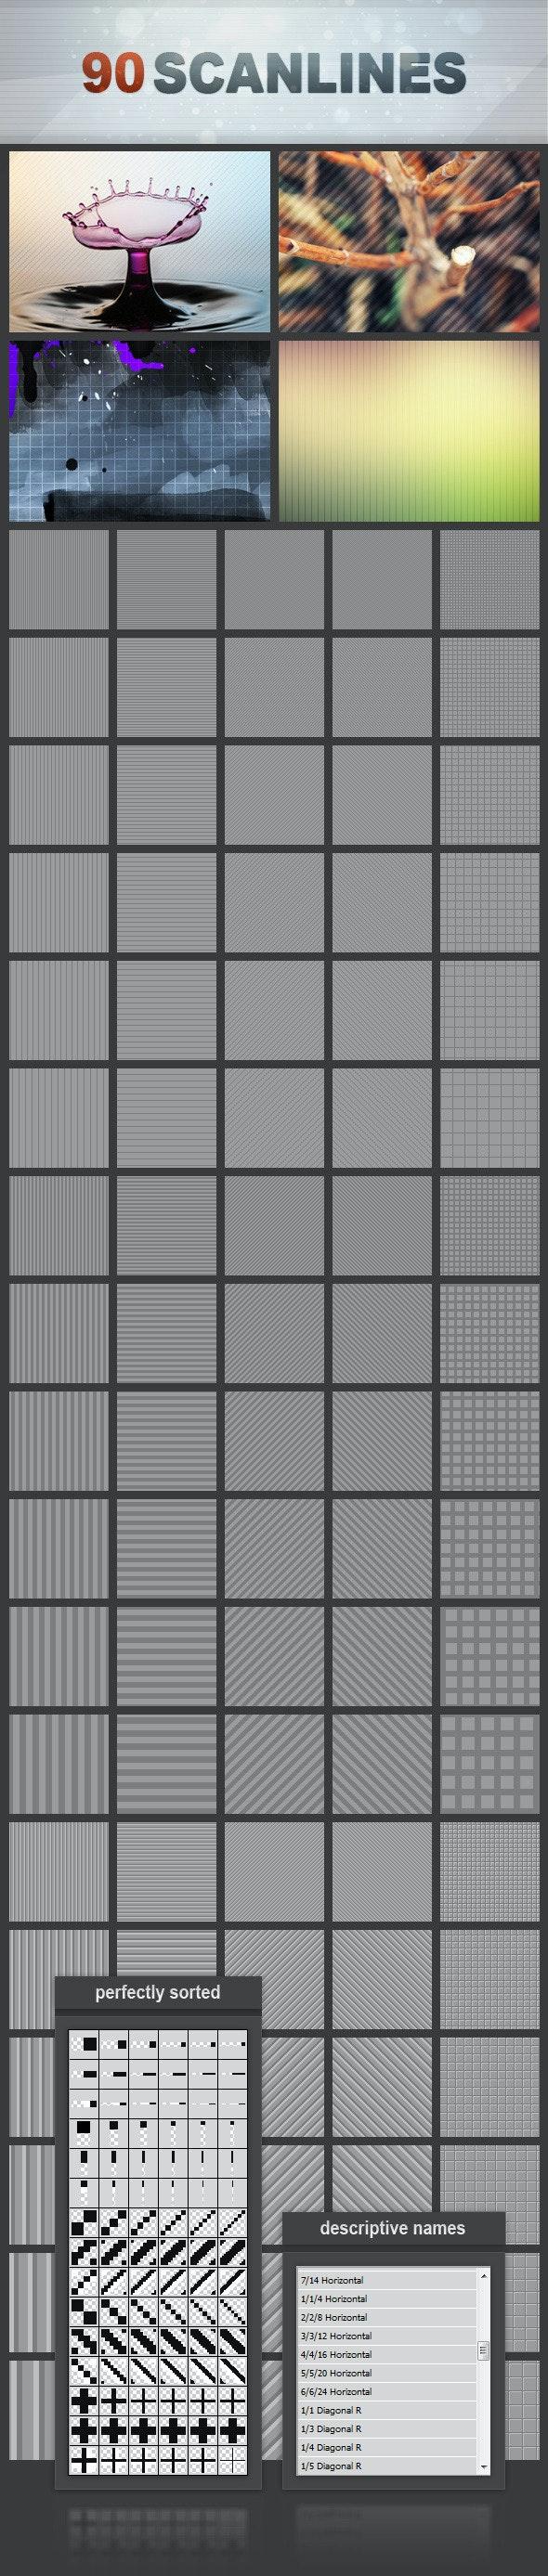 90 Scanlines Mega Pack - Miscellaneous Textures / Fills / Patterns